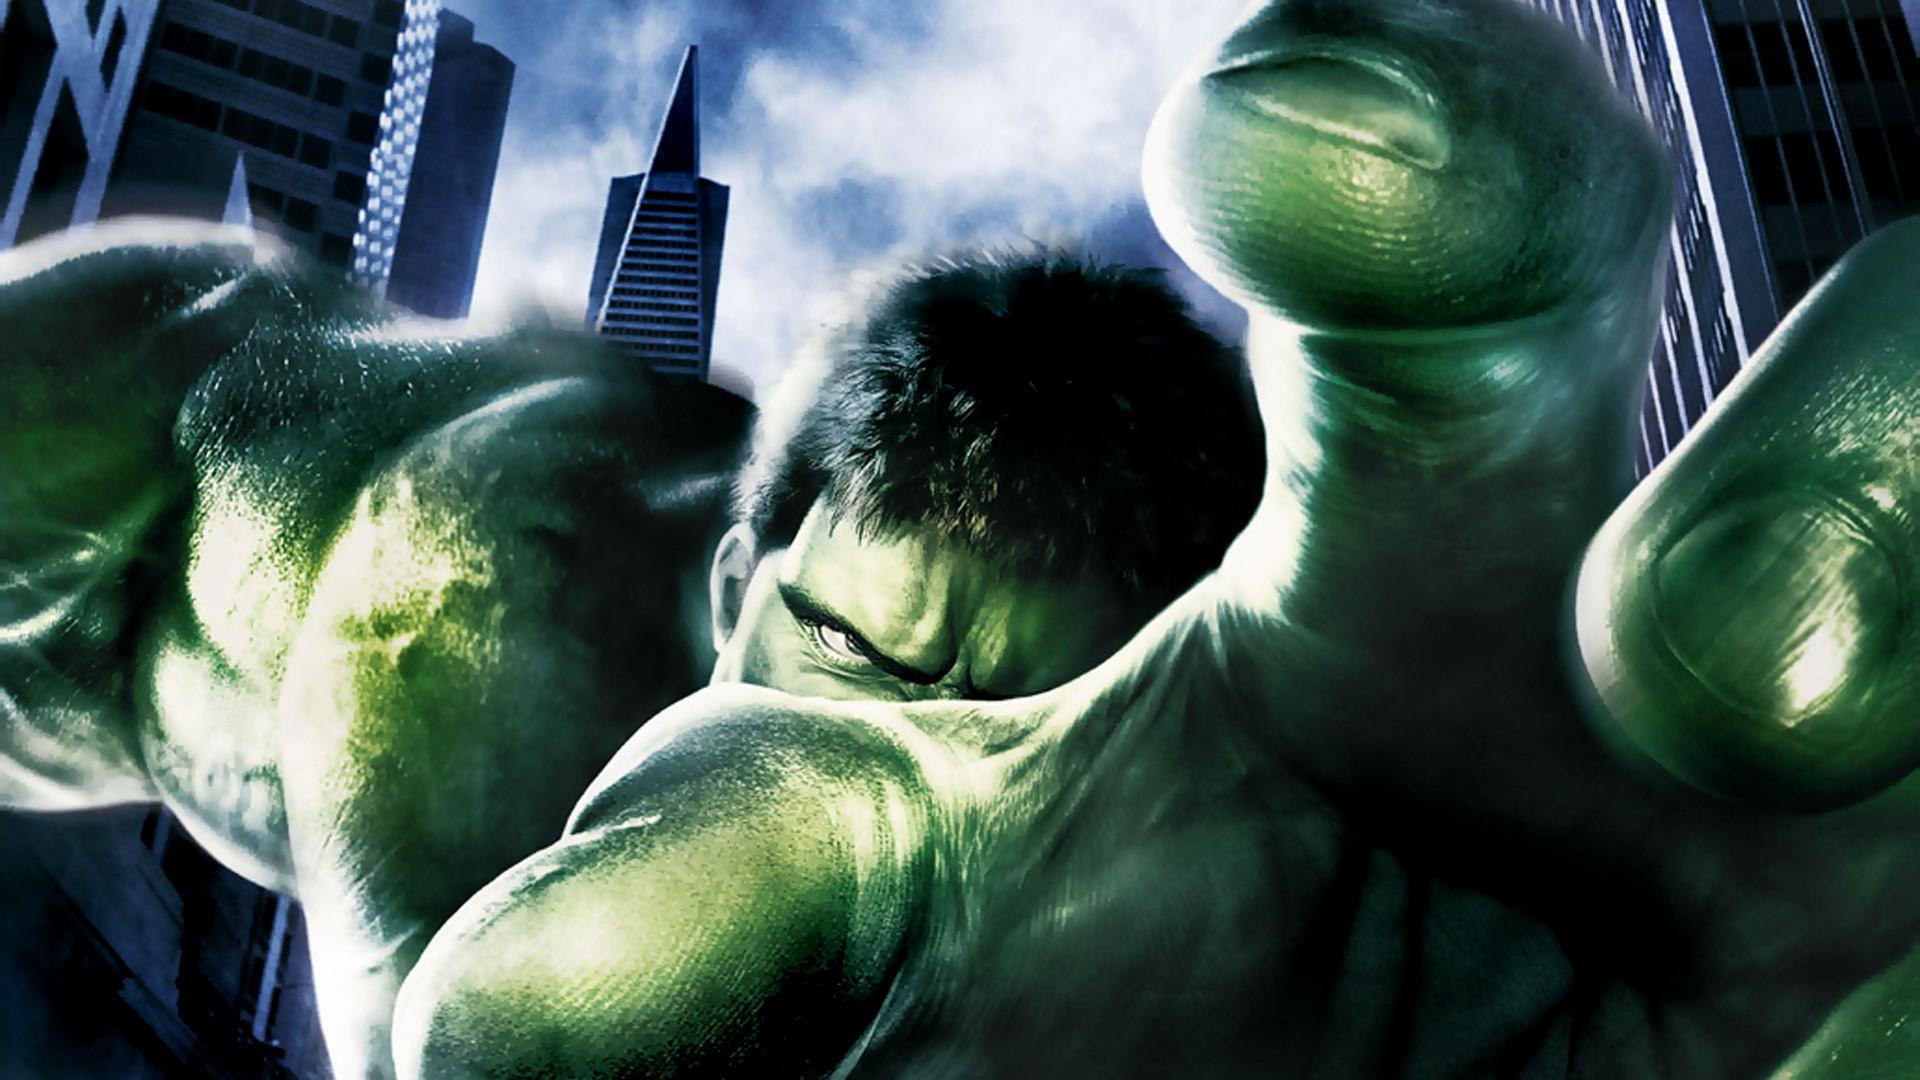 Hulk Movie Wallpapers HD Wallpapers 1920x1080